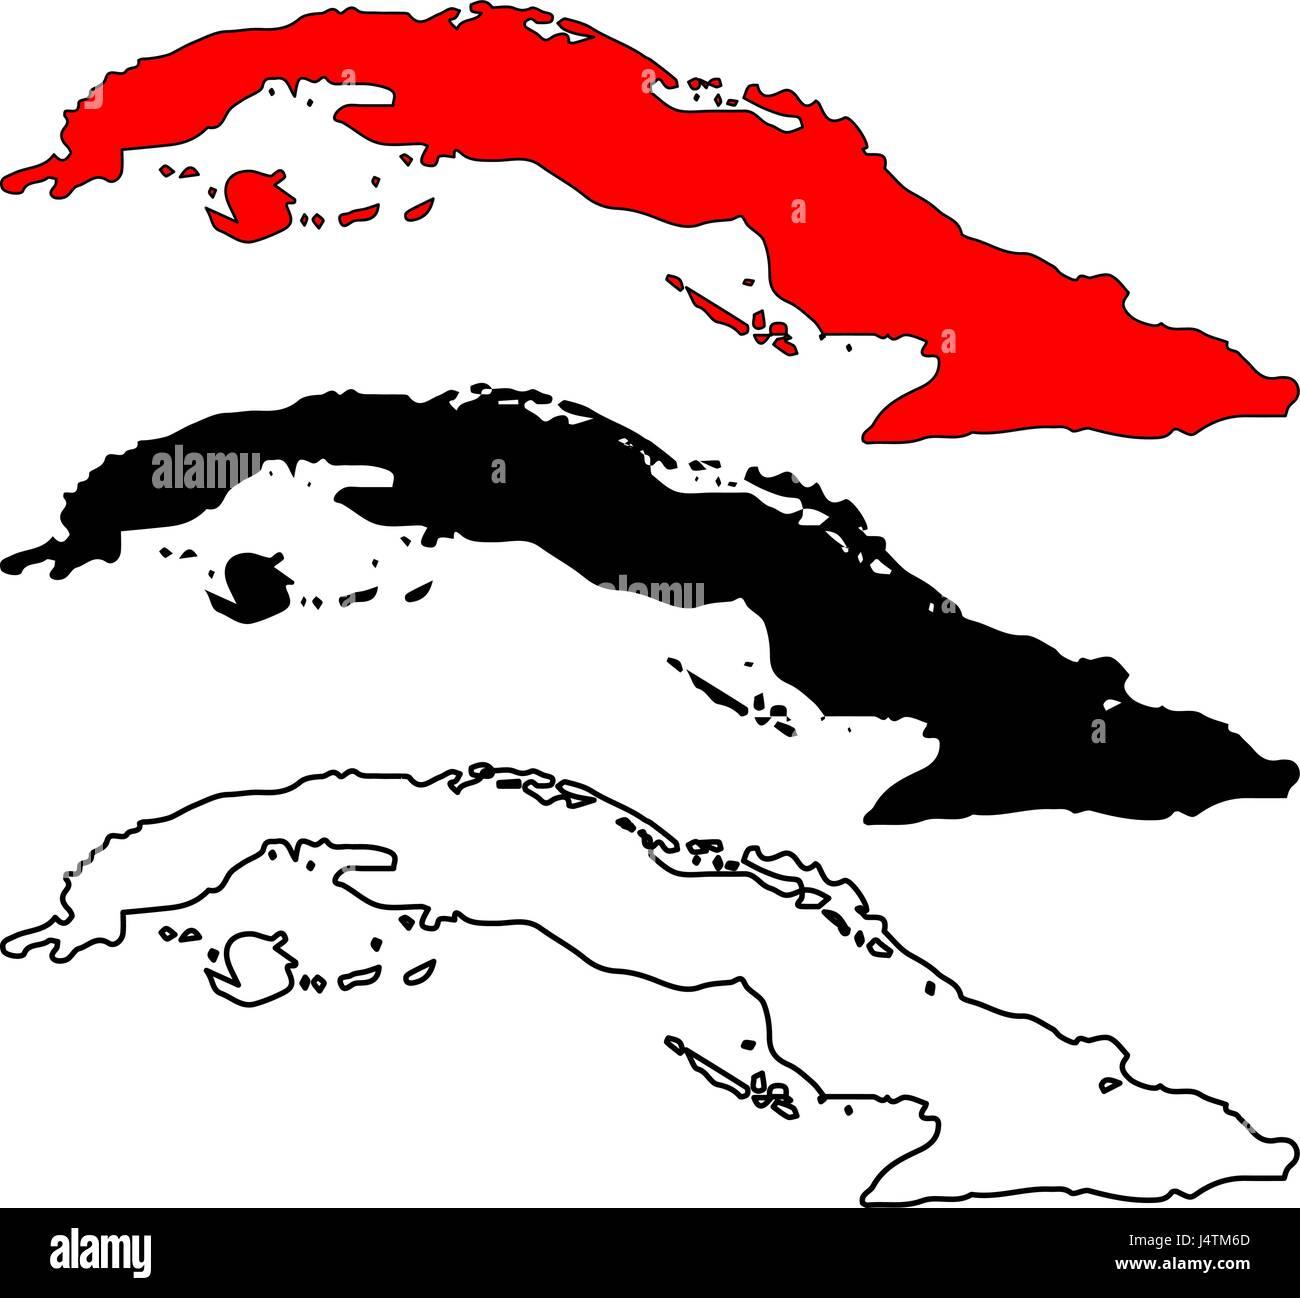 Cuba map vector illustration, scribble sketch Cuba - Stock Image